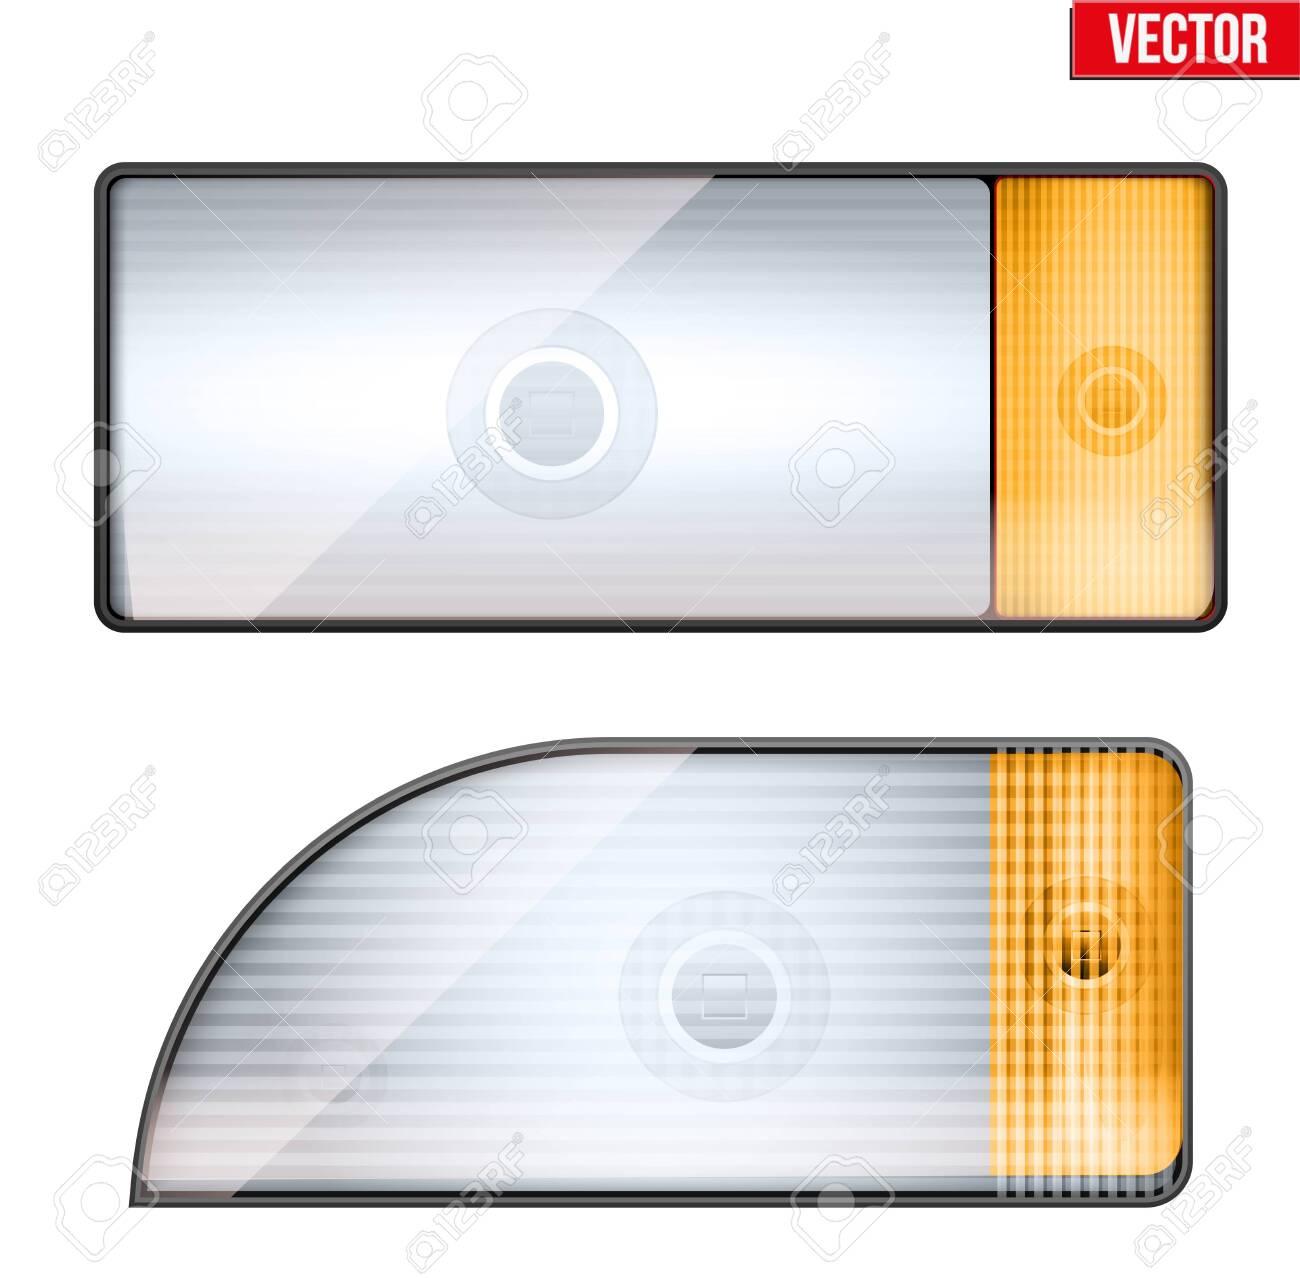 Rectangular car headlight and turn indicator  Glass case of frontlight